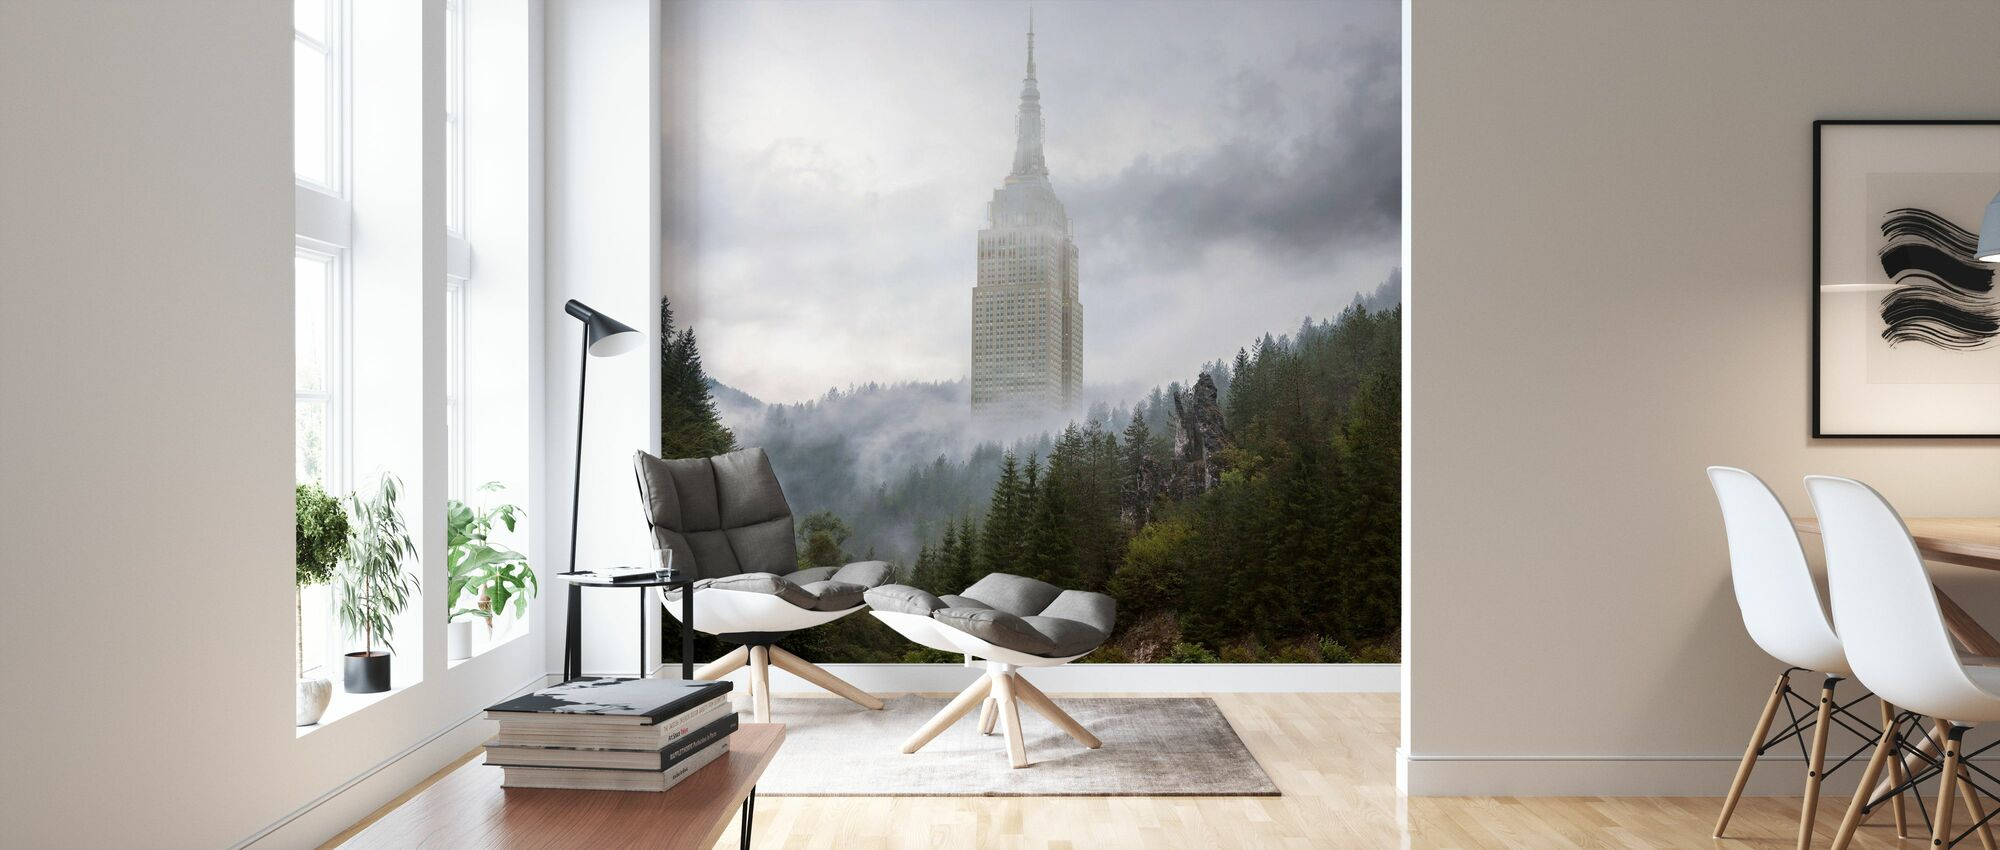 Forecity II - Wallpaper - Living Room